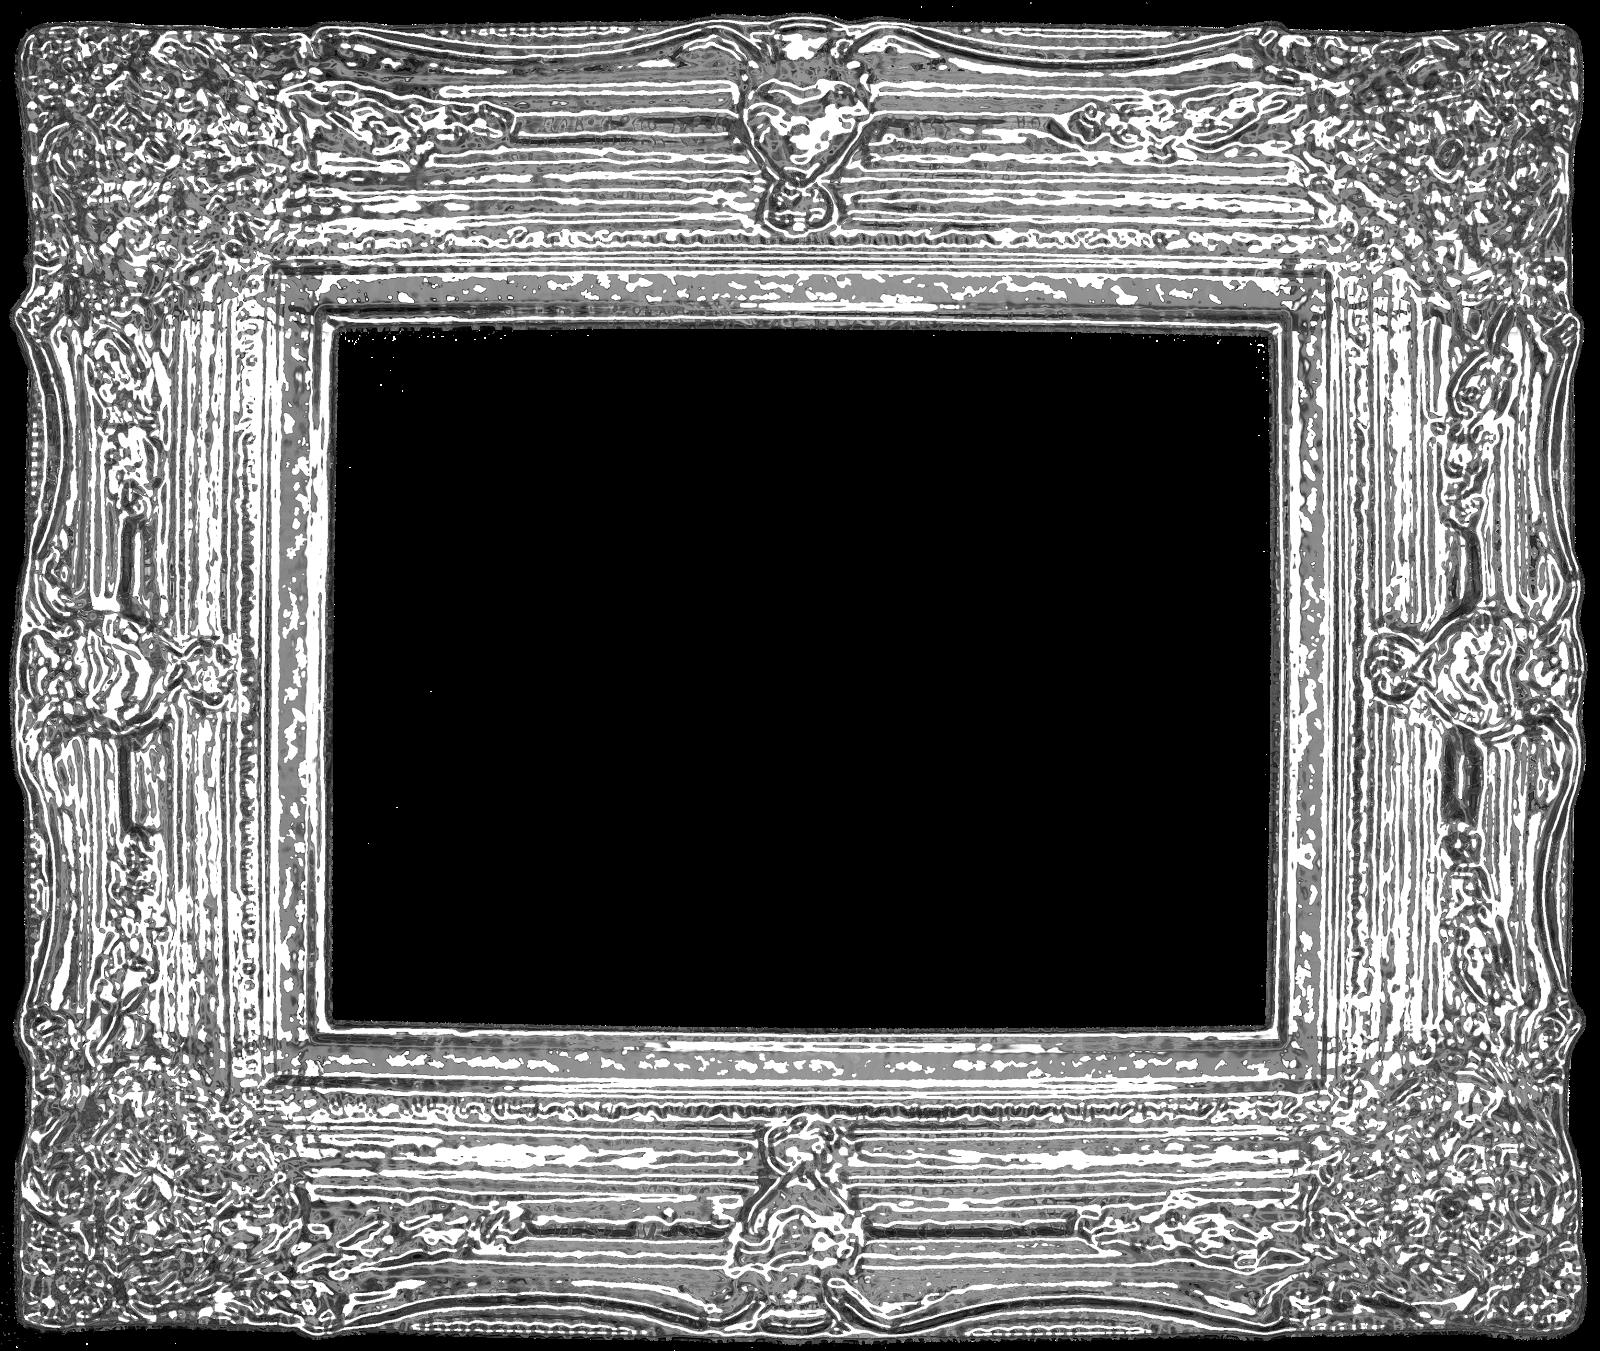 Freebie 4: Fancy Vintage Ornate Digital Frames!